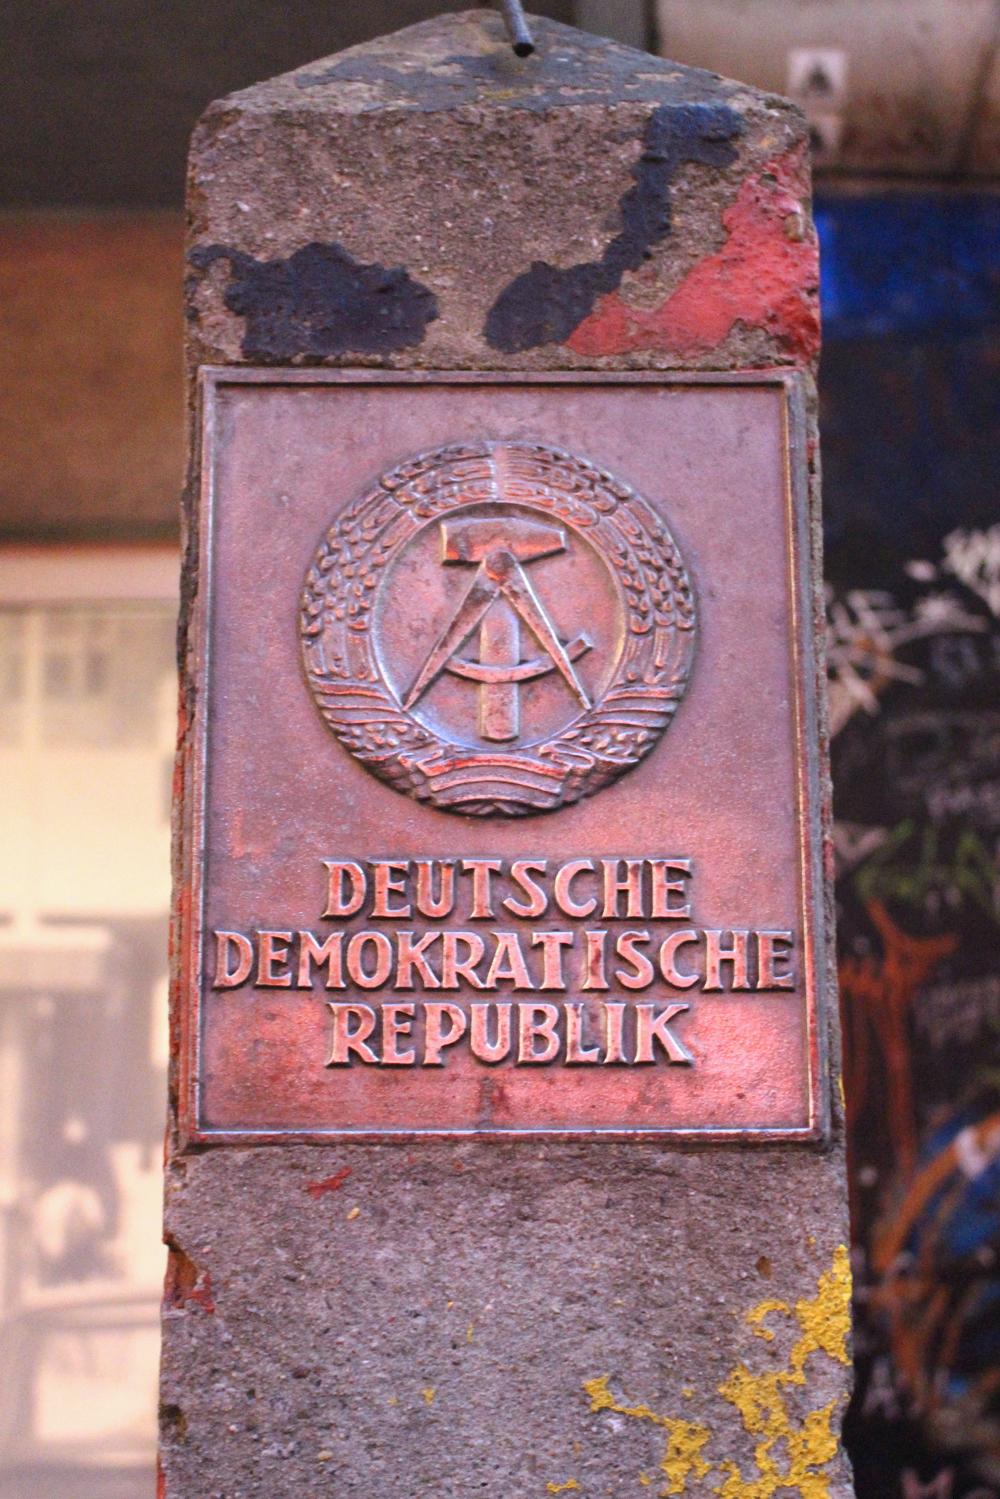 Deutsche Demokratische Republik sign in Berlin - travel & lifestyle blog